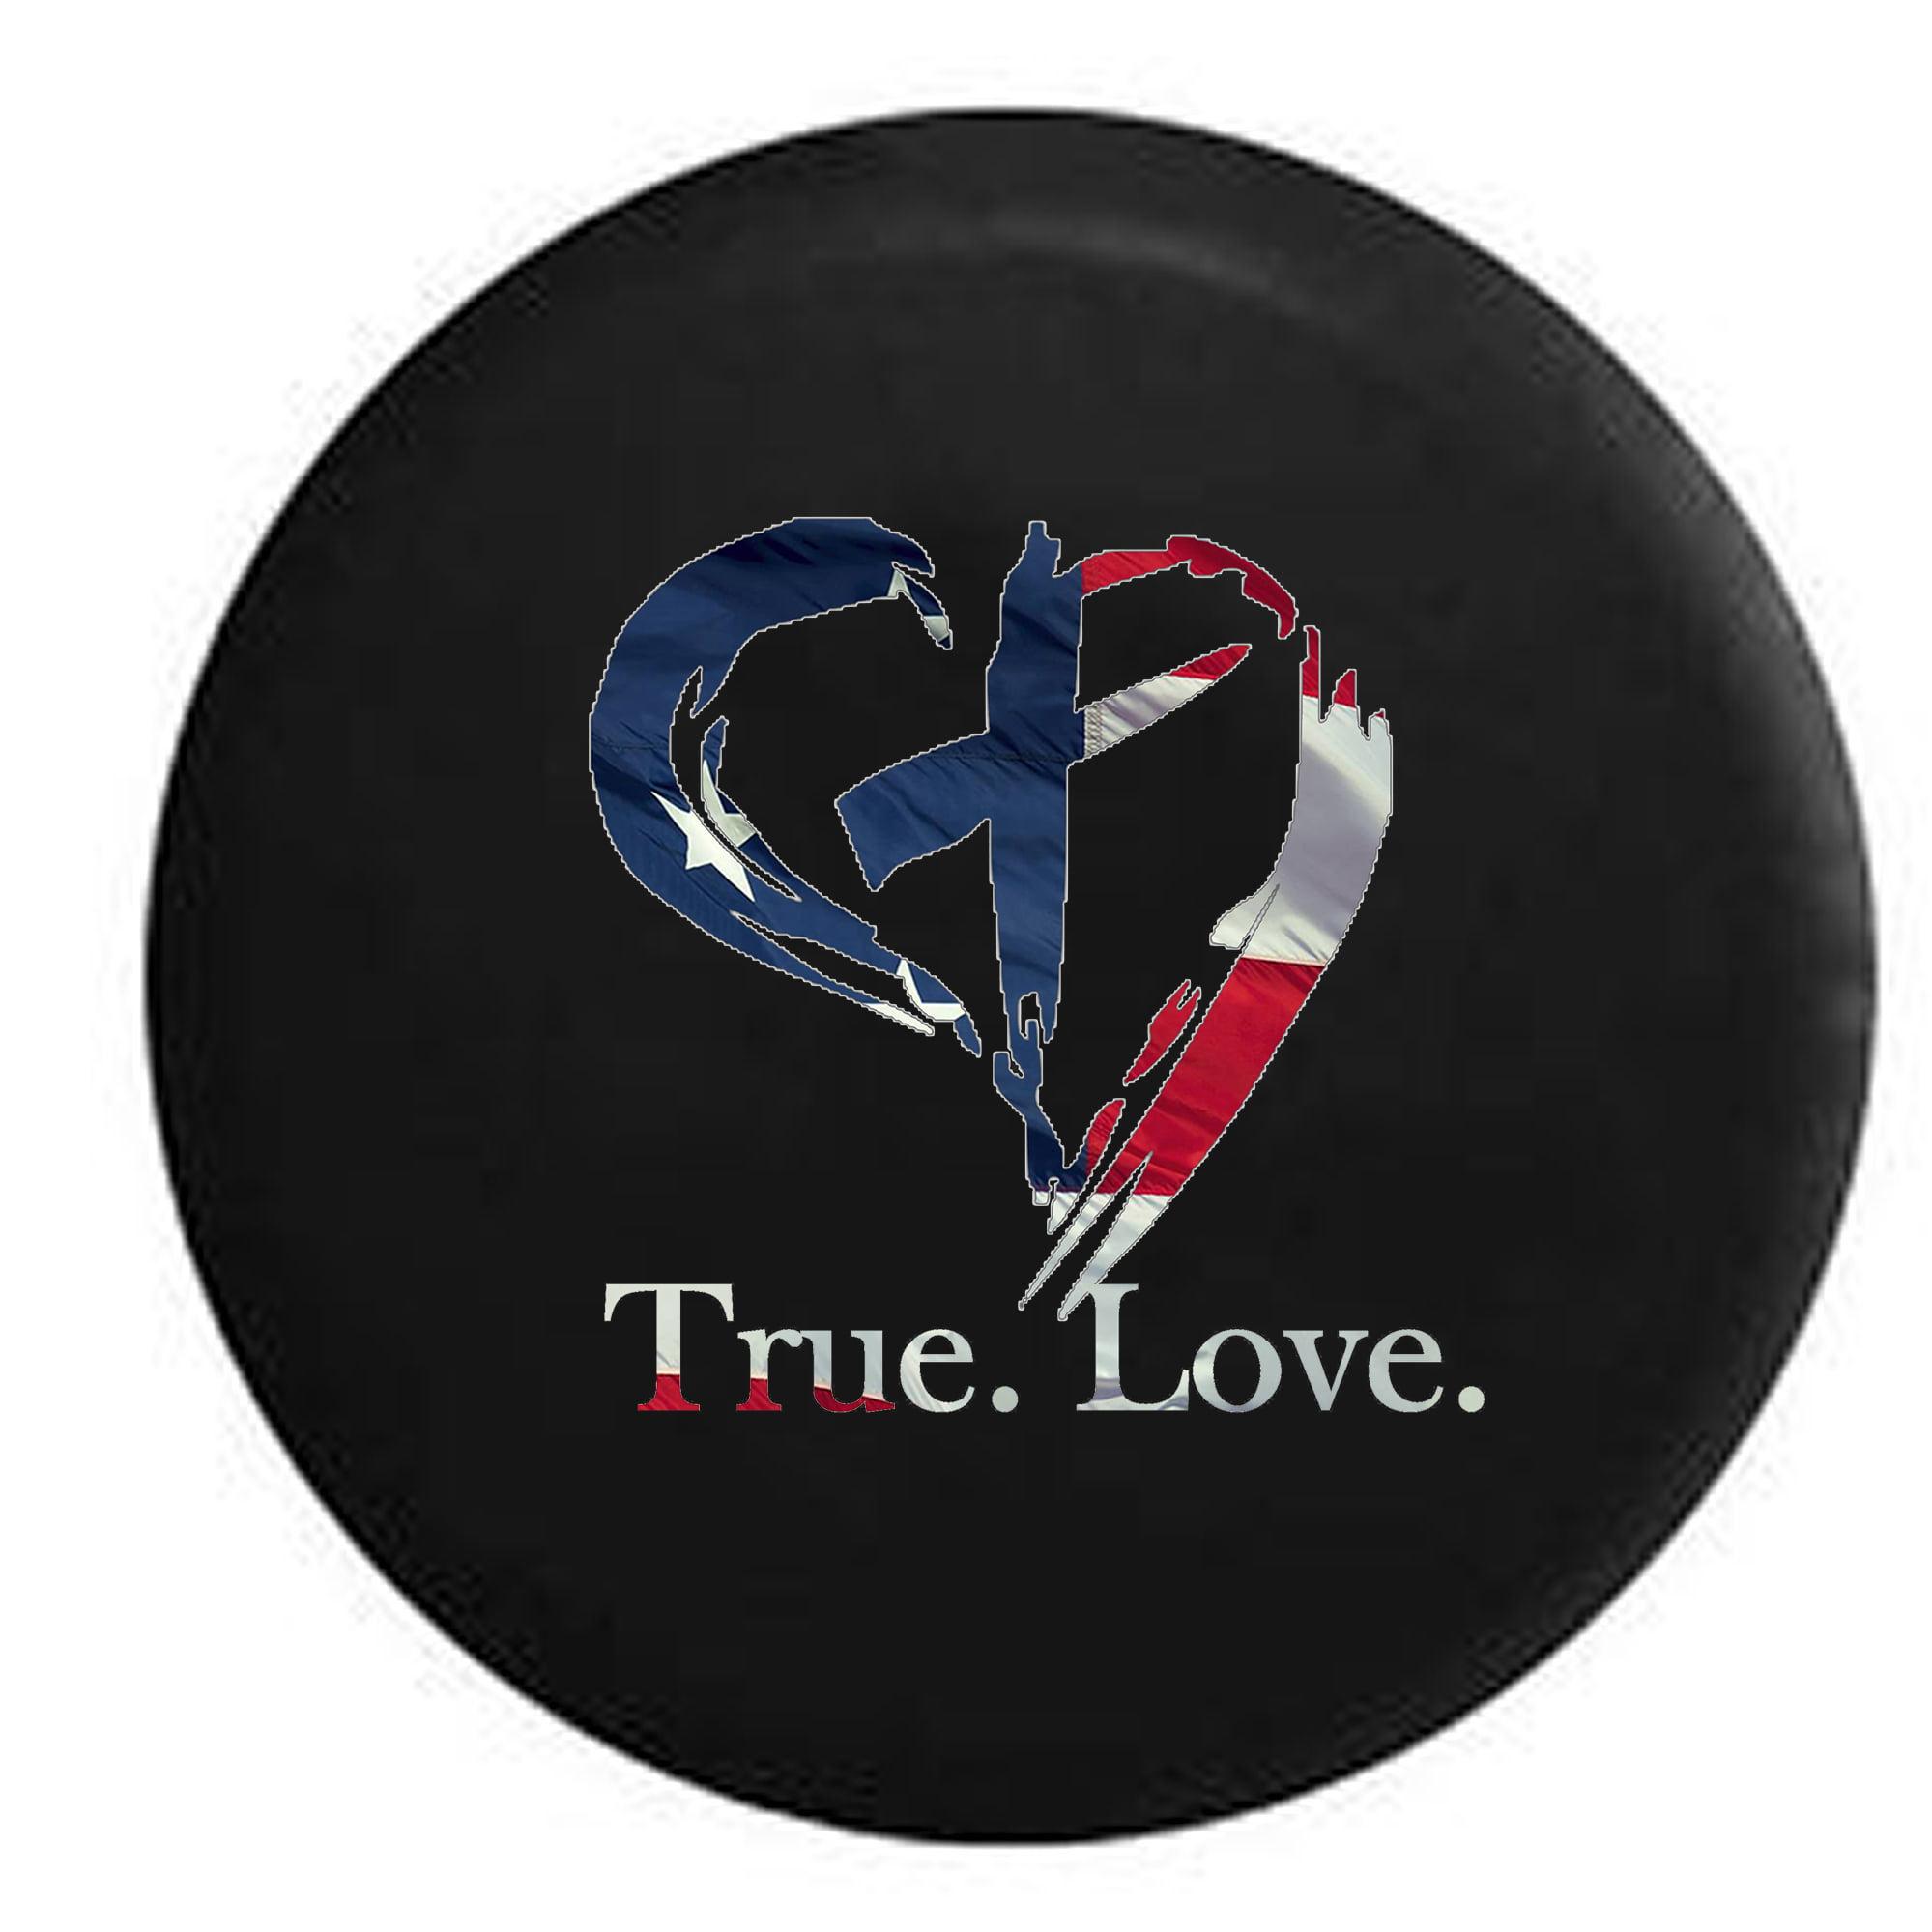 Heart Artistic Love Jeep Gir lSpare Tire Cover Vinyl Black 33 in